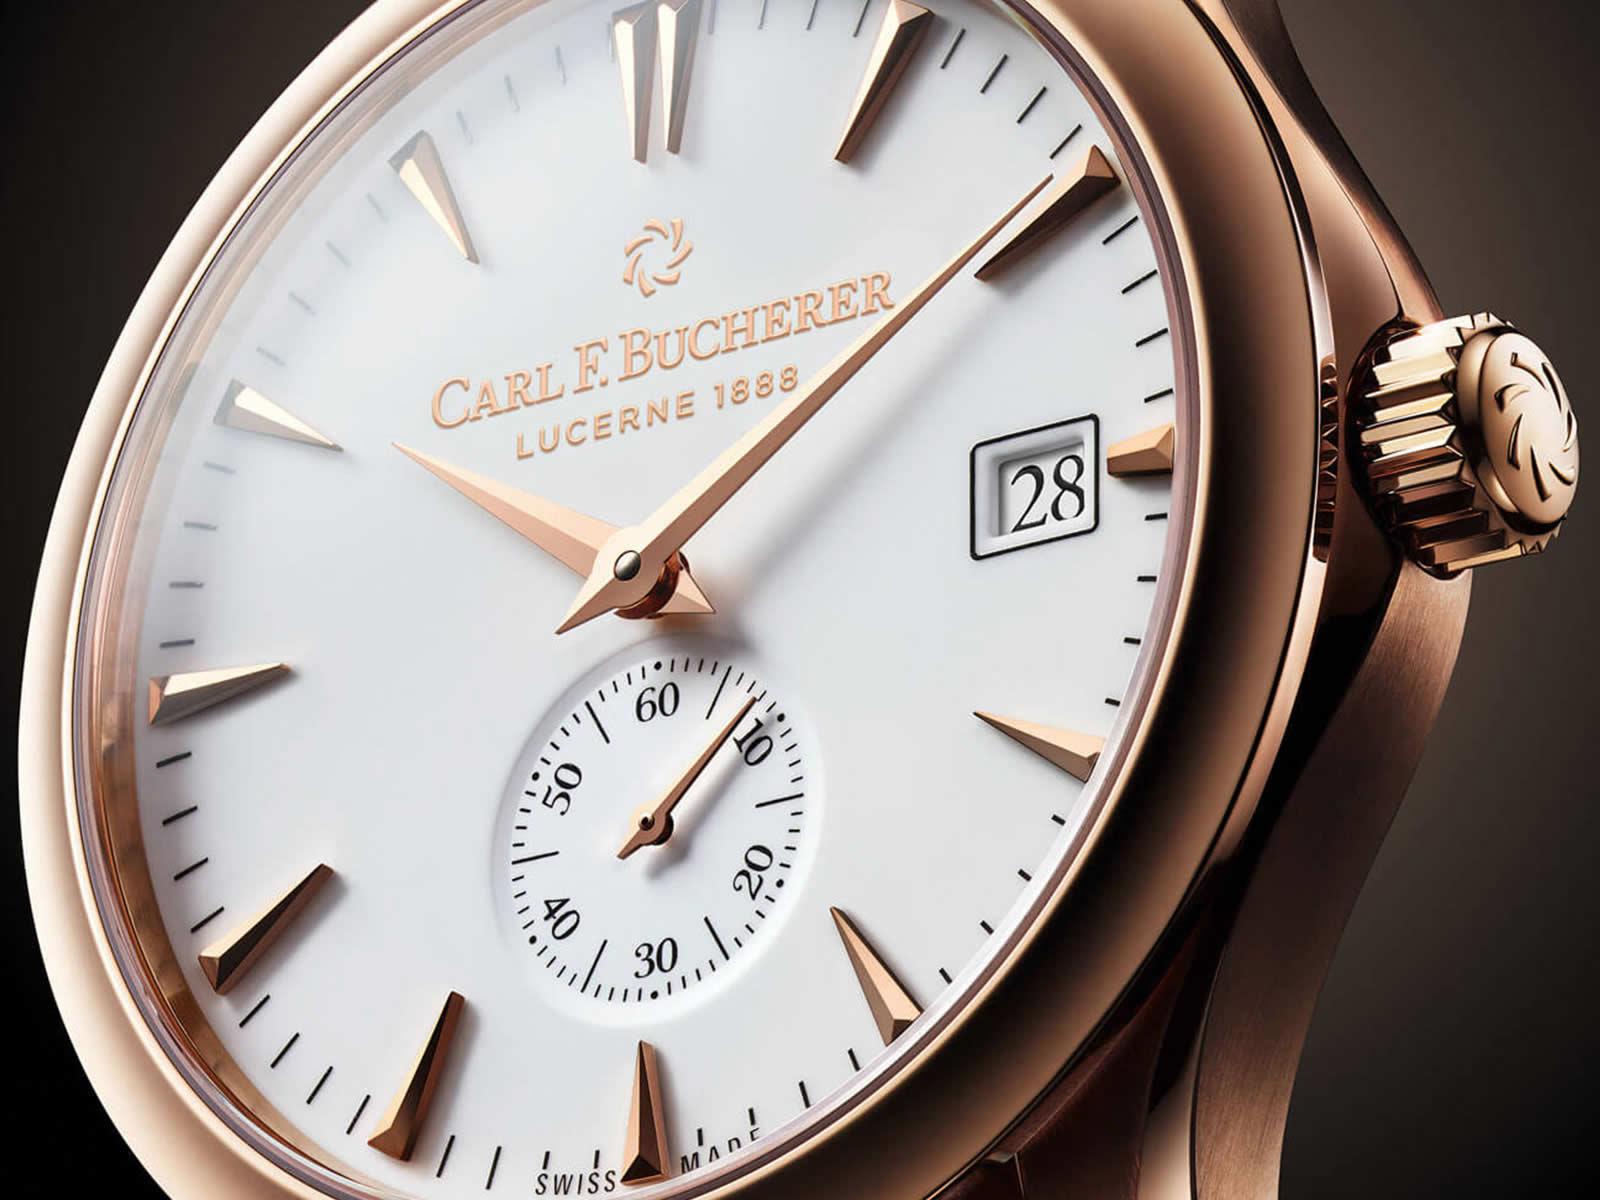 Carl-F-Bucherer-Manero-Peripheral-43-00-10921-03-23-01-4-O.jpg